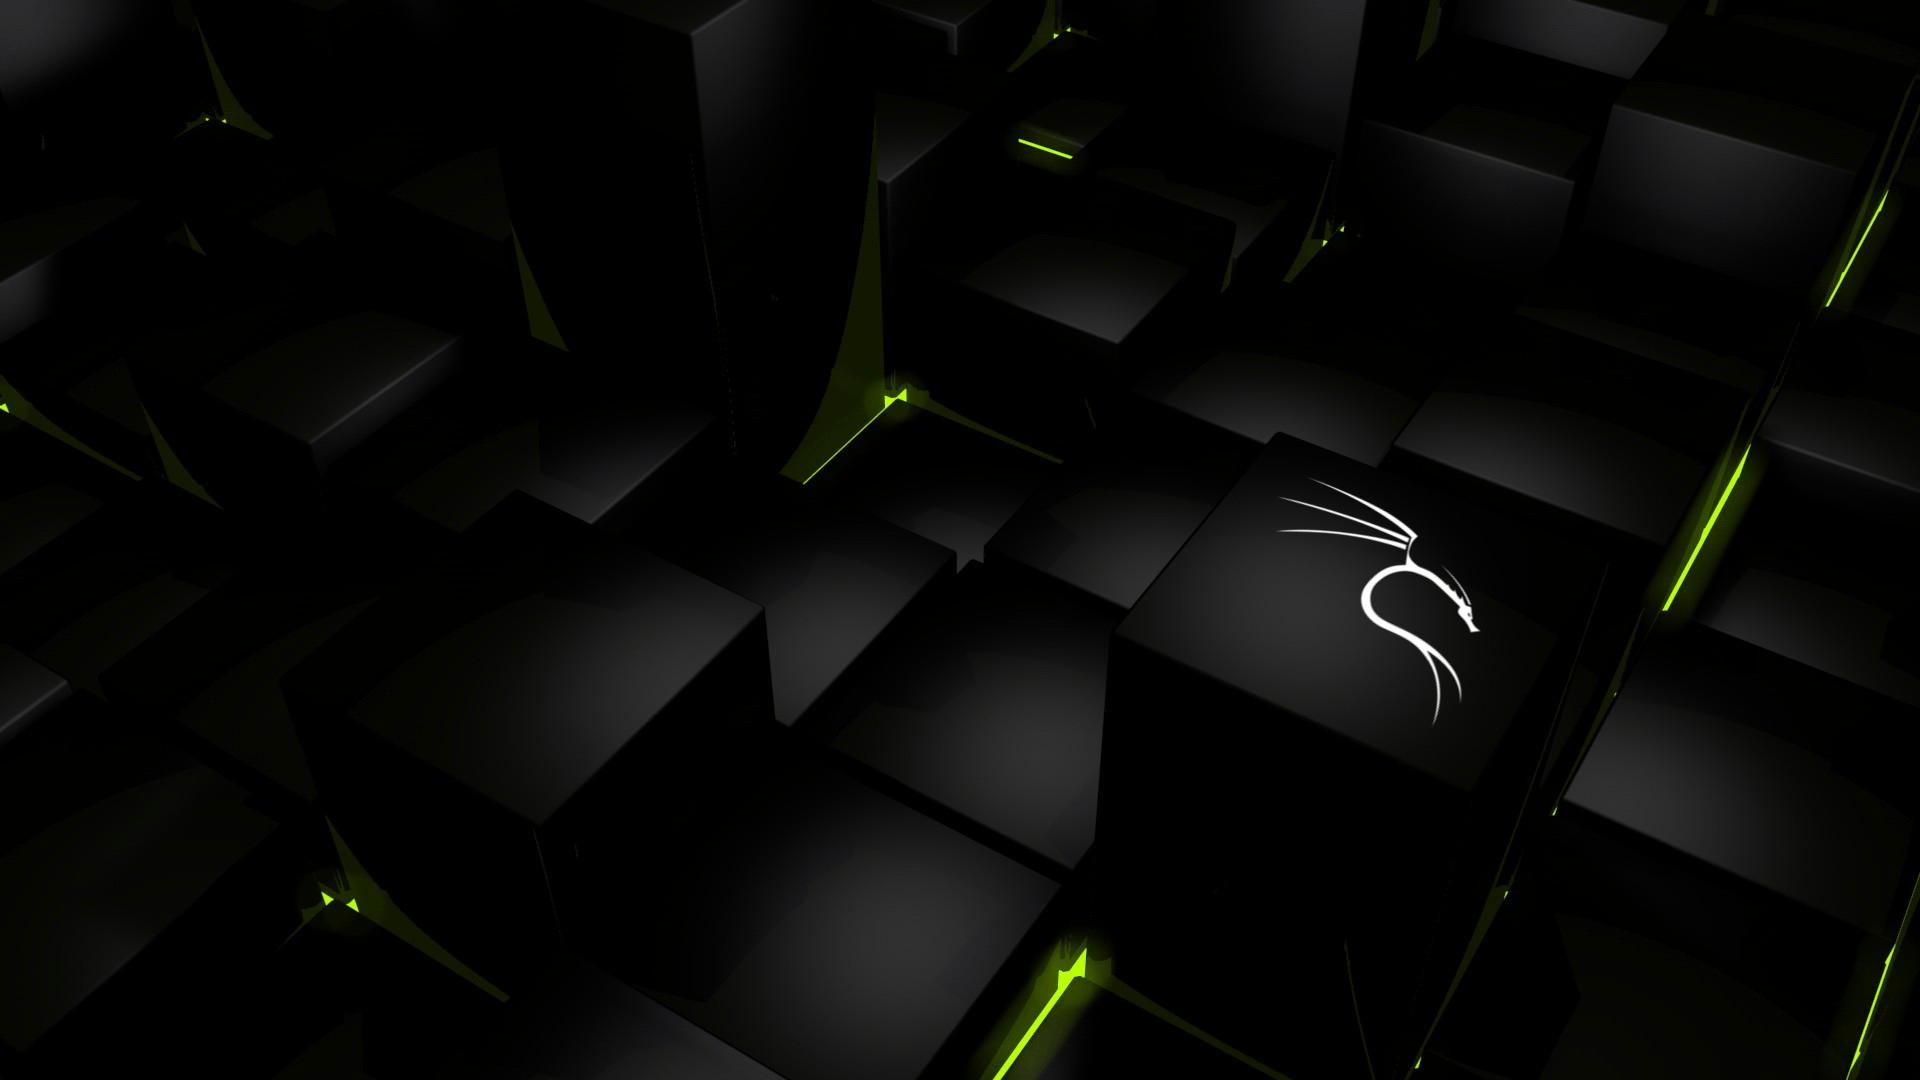 Kali Linux Wallpapers - Wallpaper Cave